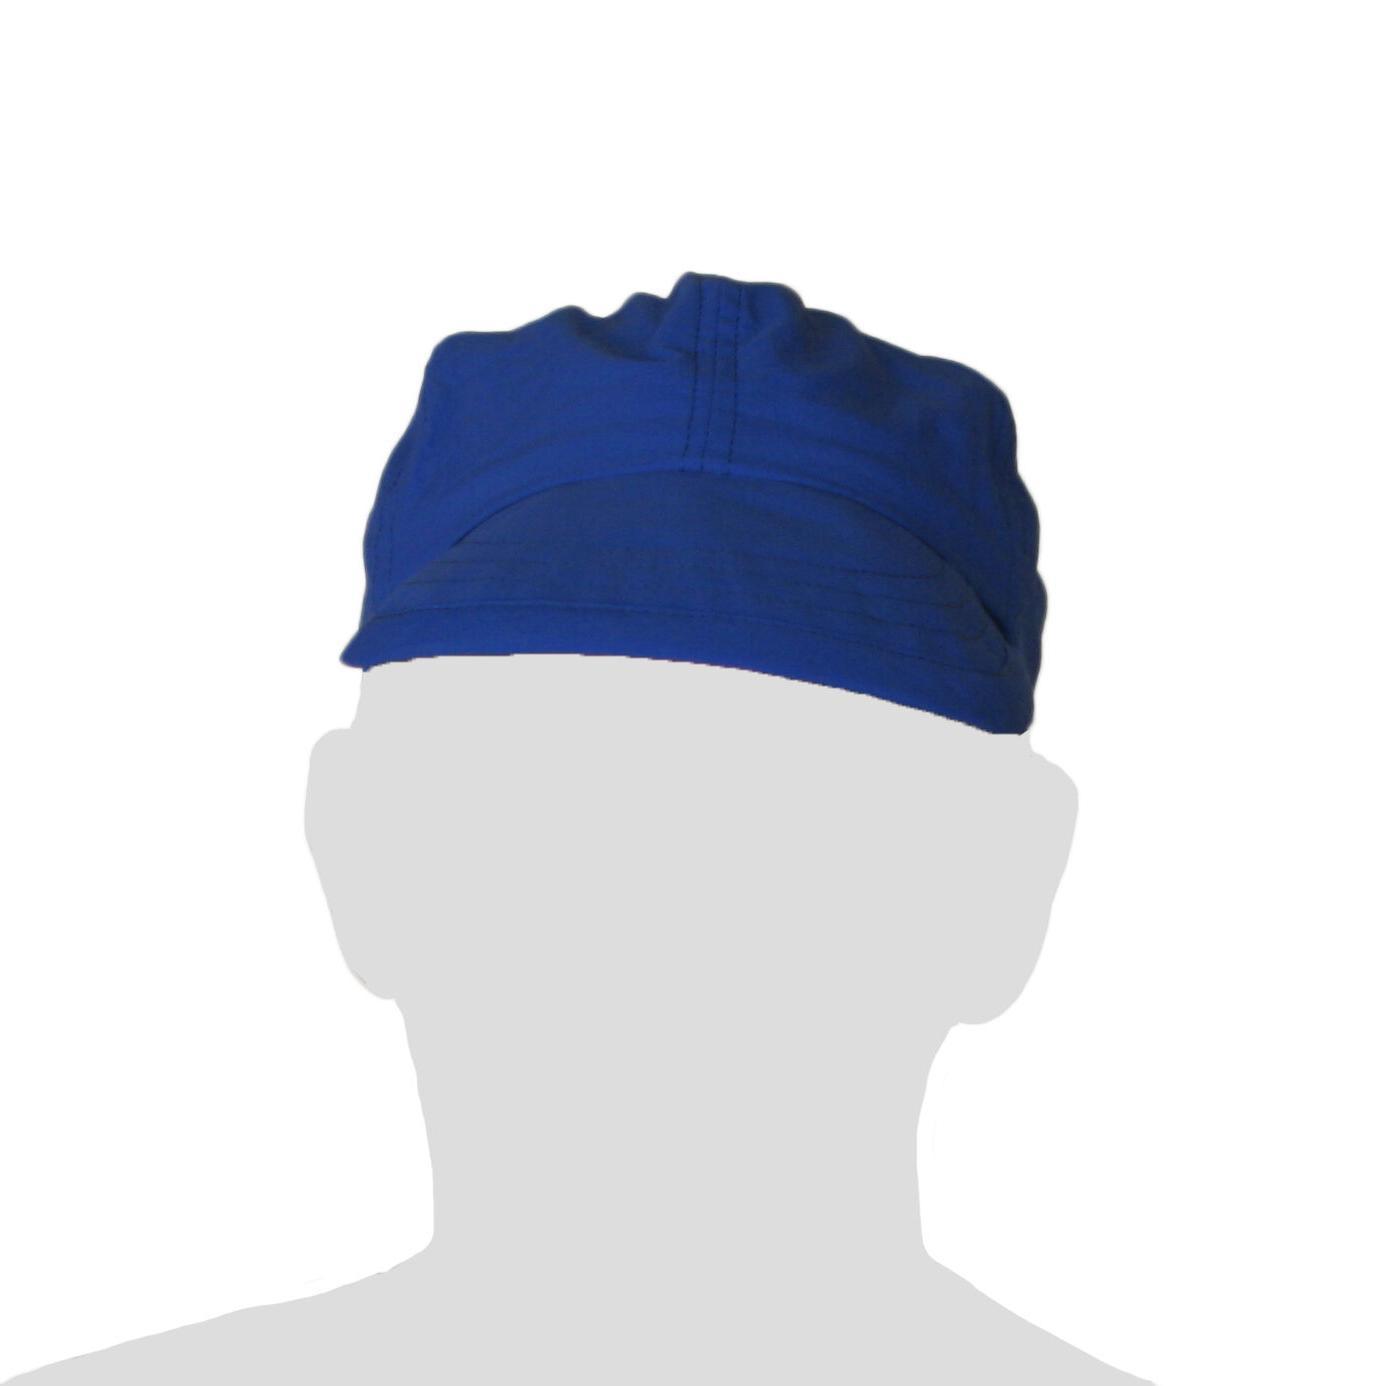 ROX Apres Nylon Hat with Crown